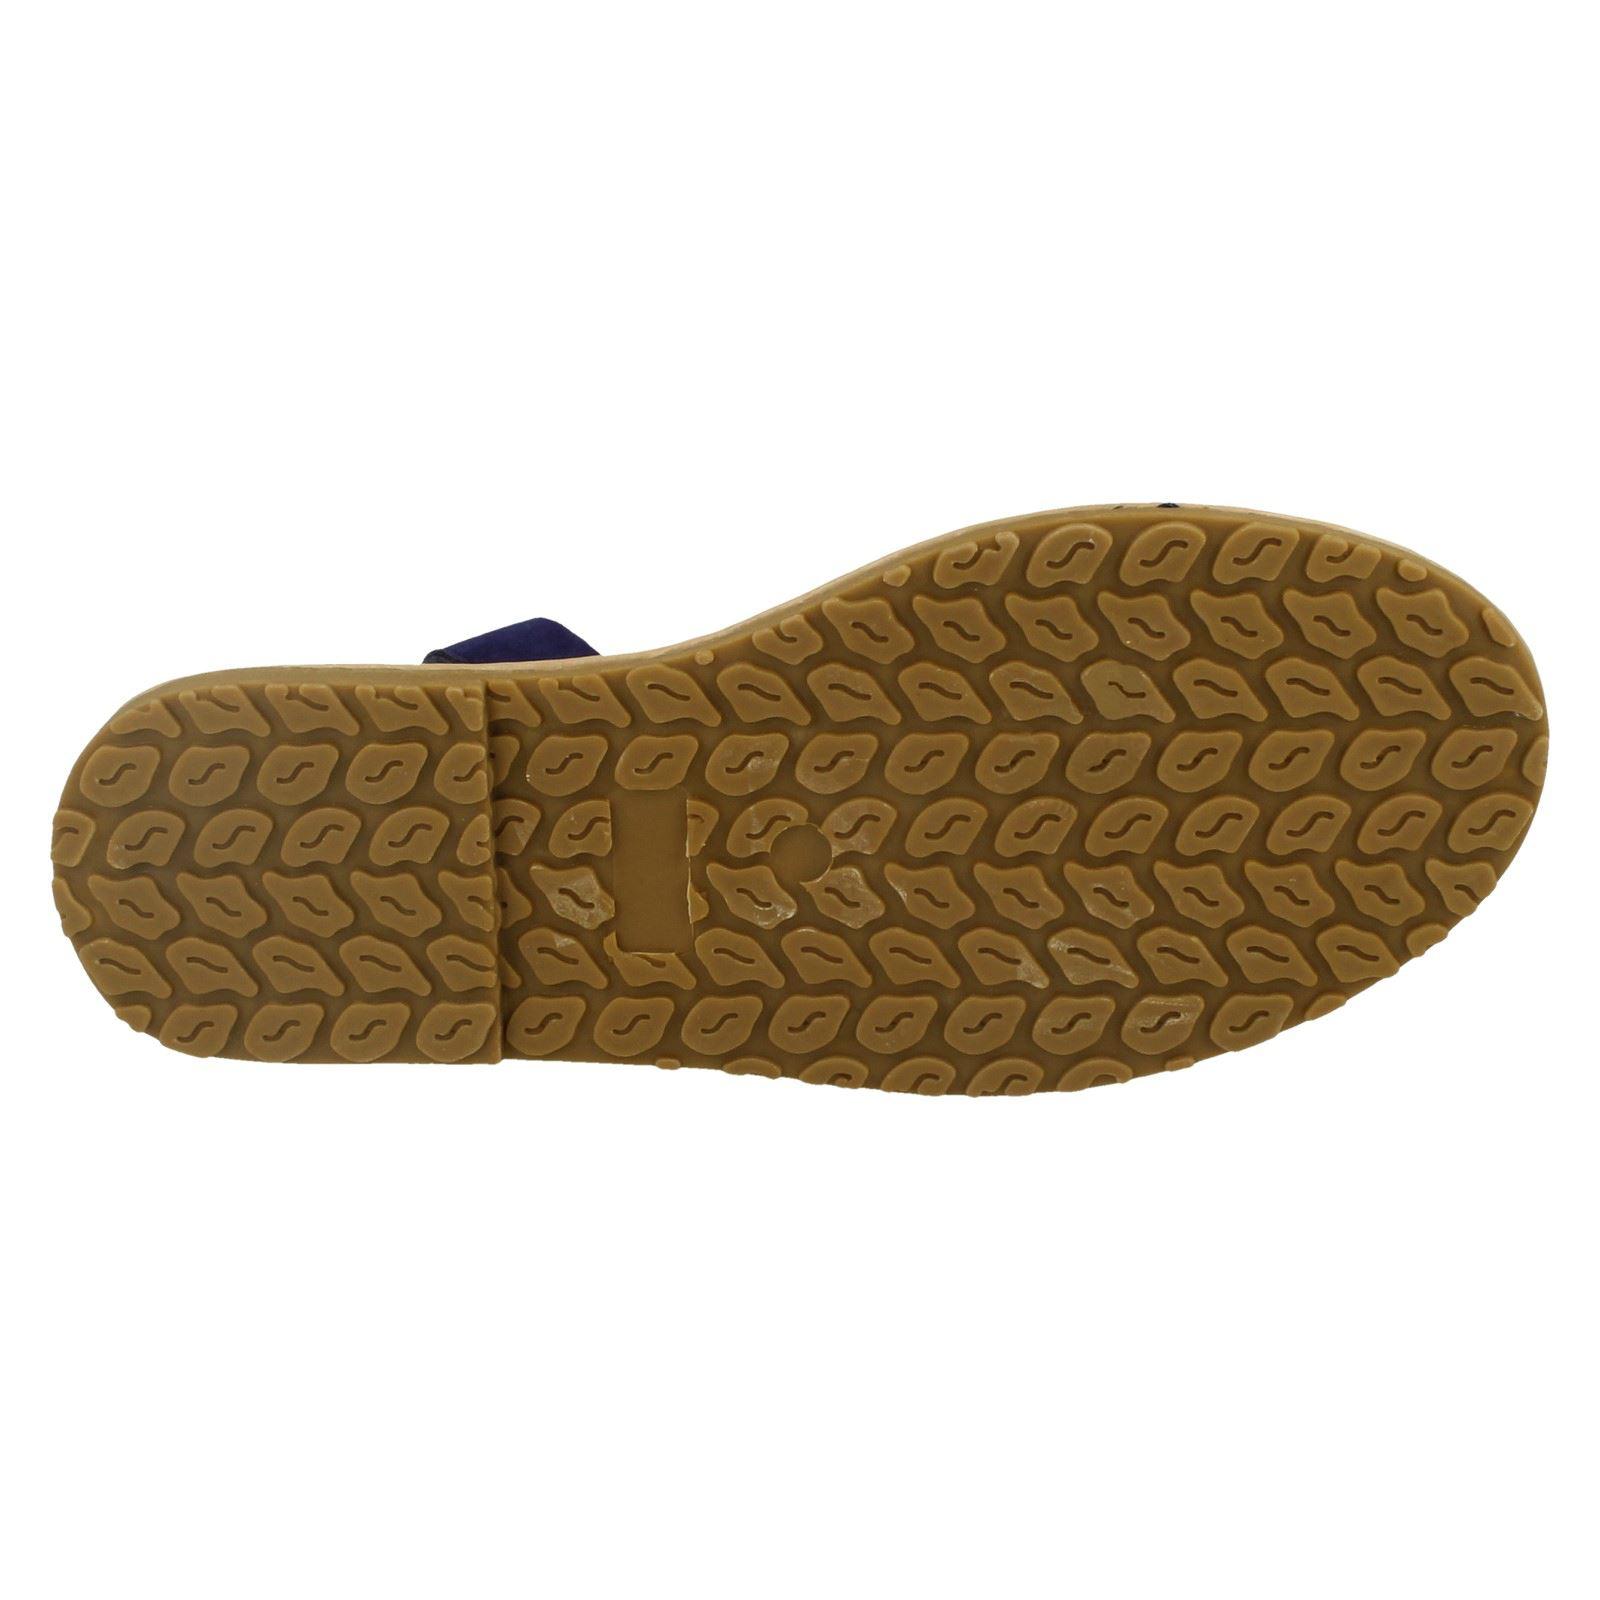 Damas Spot On Sintético Slip On Elástico Charol Sandalias planas de puntera abierta